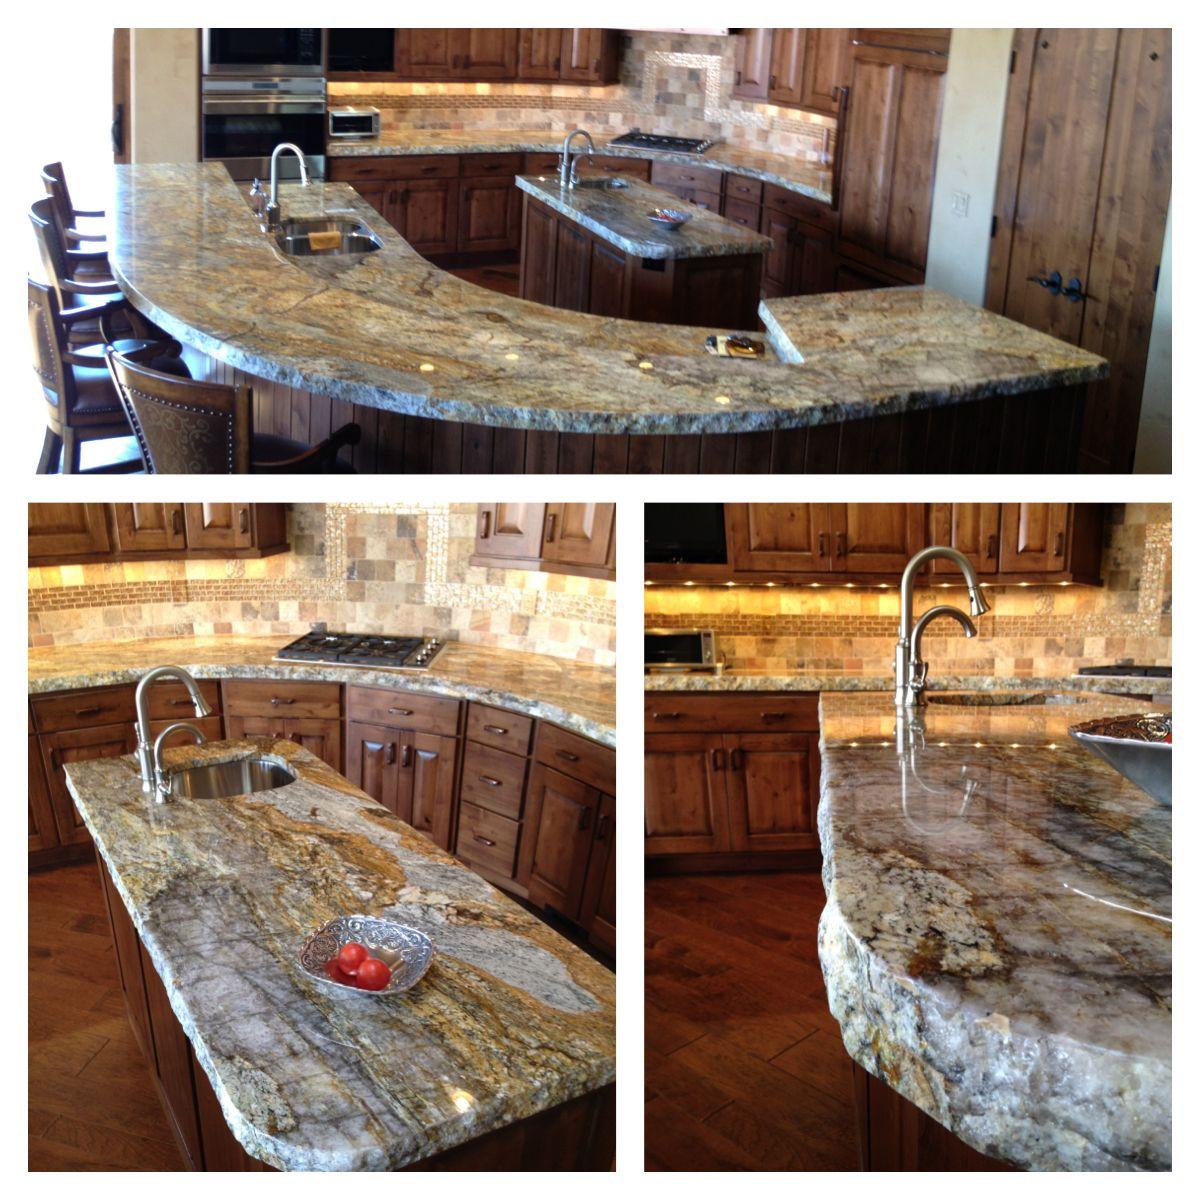 GOLDEN RAY GRANITE. Odd Backsplash. The Granite Gurus: Golden Ray Granite  Kitchen From